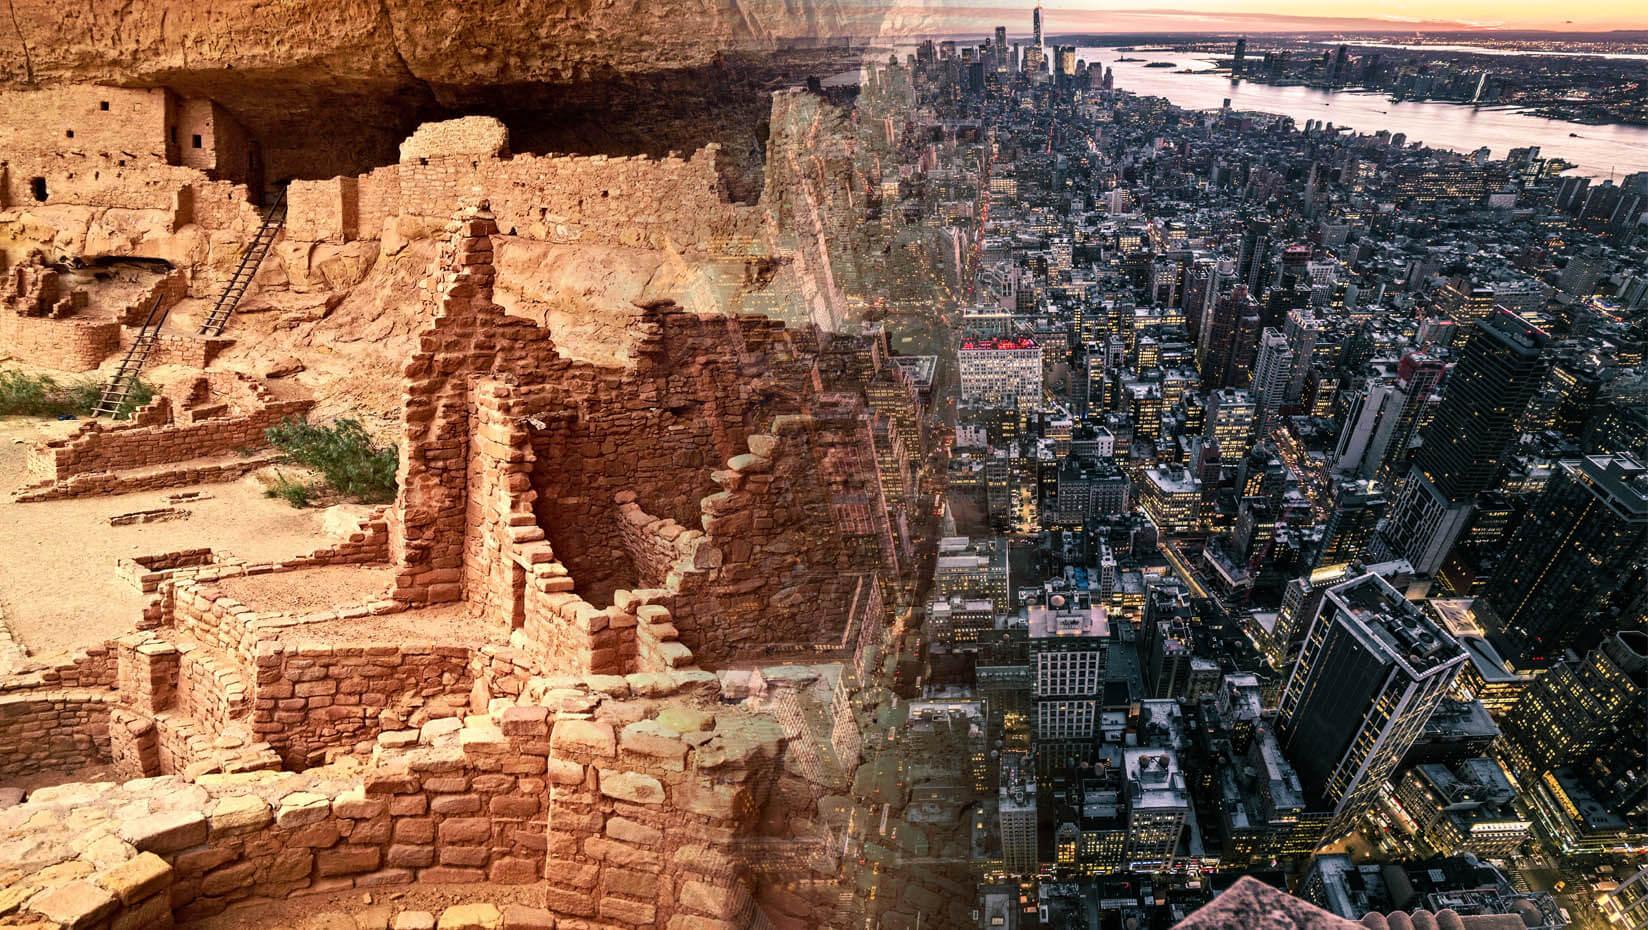 An ancient civilization morphs into a modern city